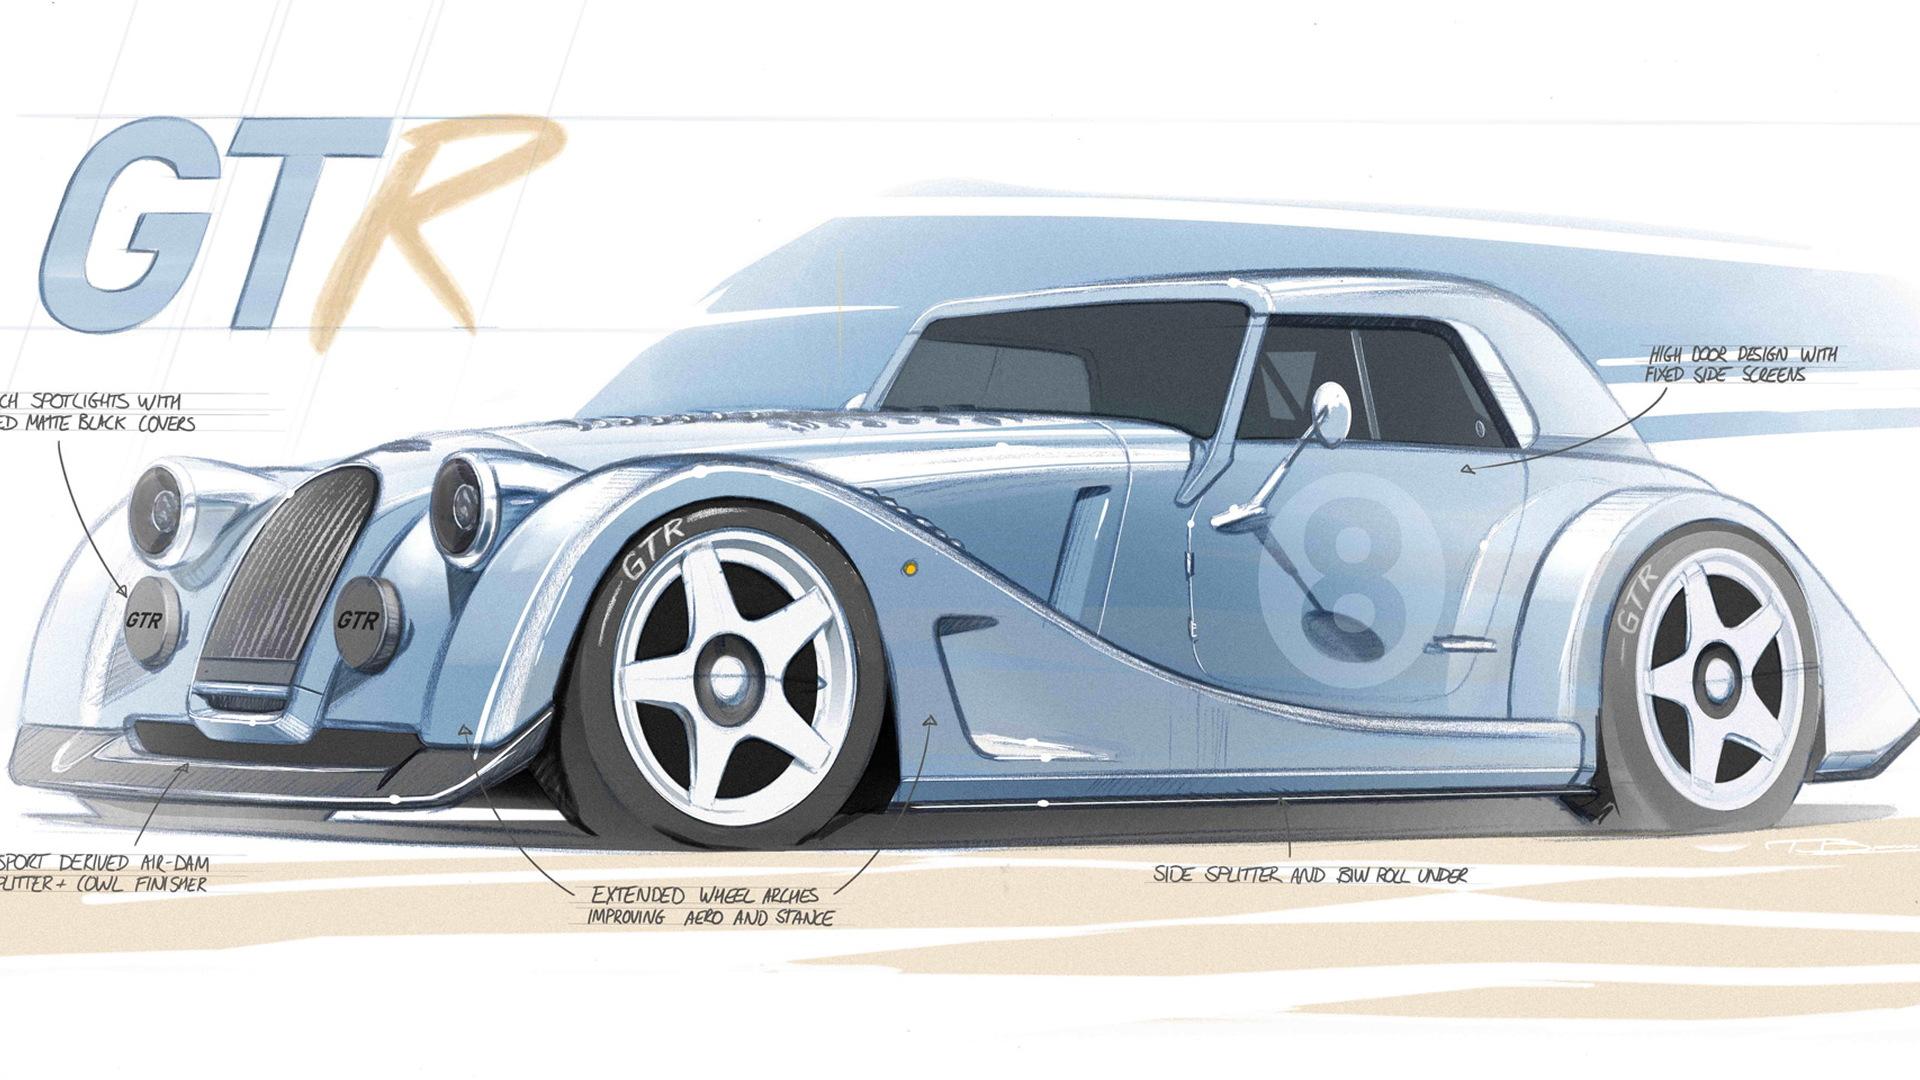 Teaser for Morgan Plus 8 GTR debuting in 2021